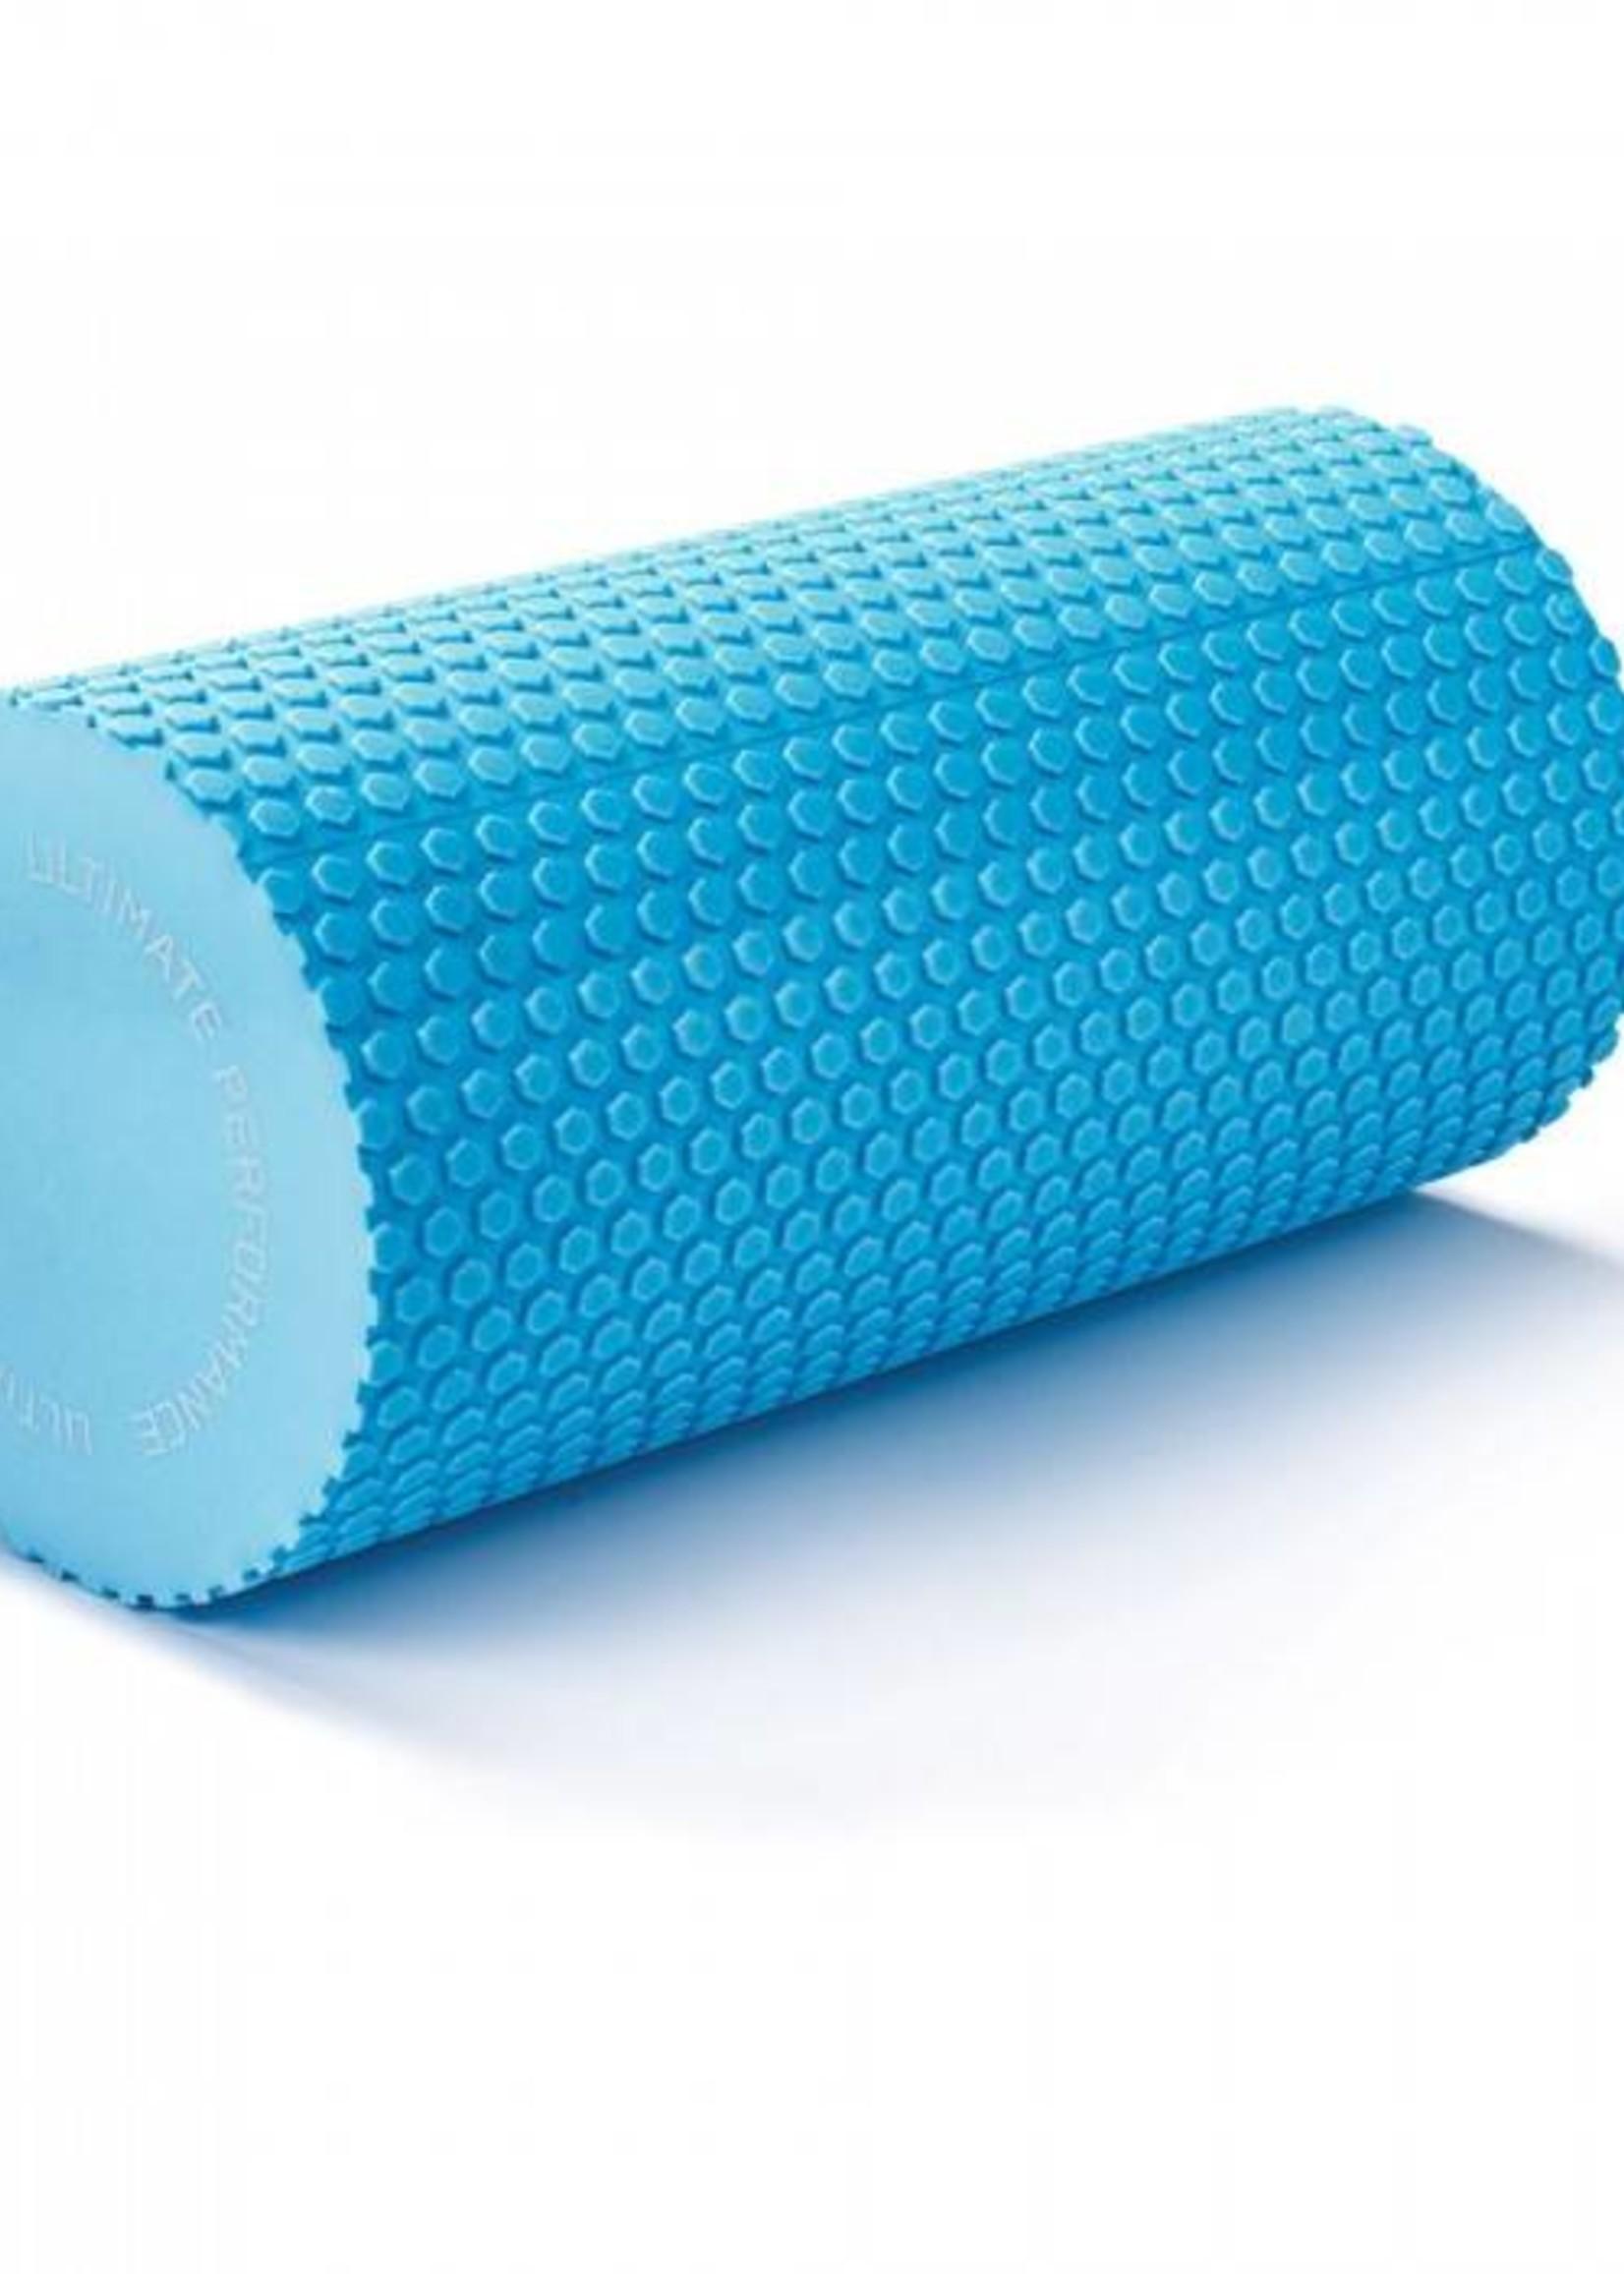 UP Performance Foam Roller